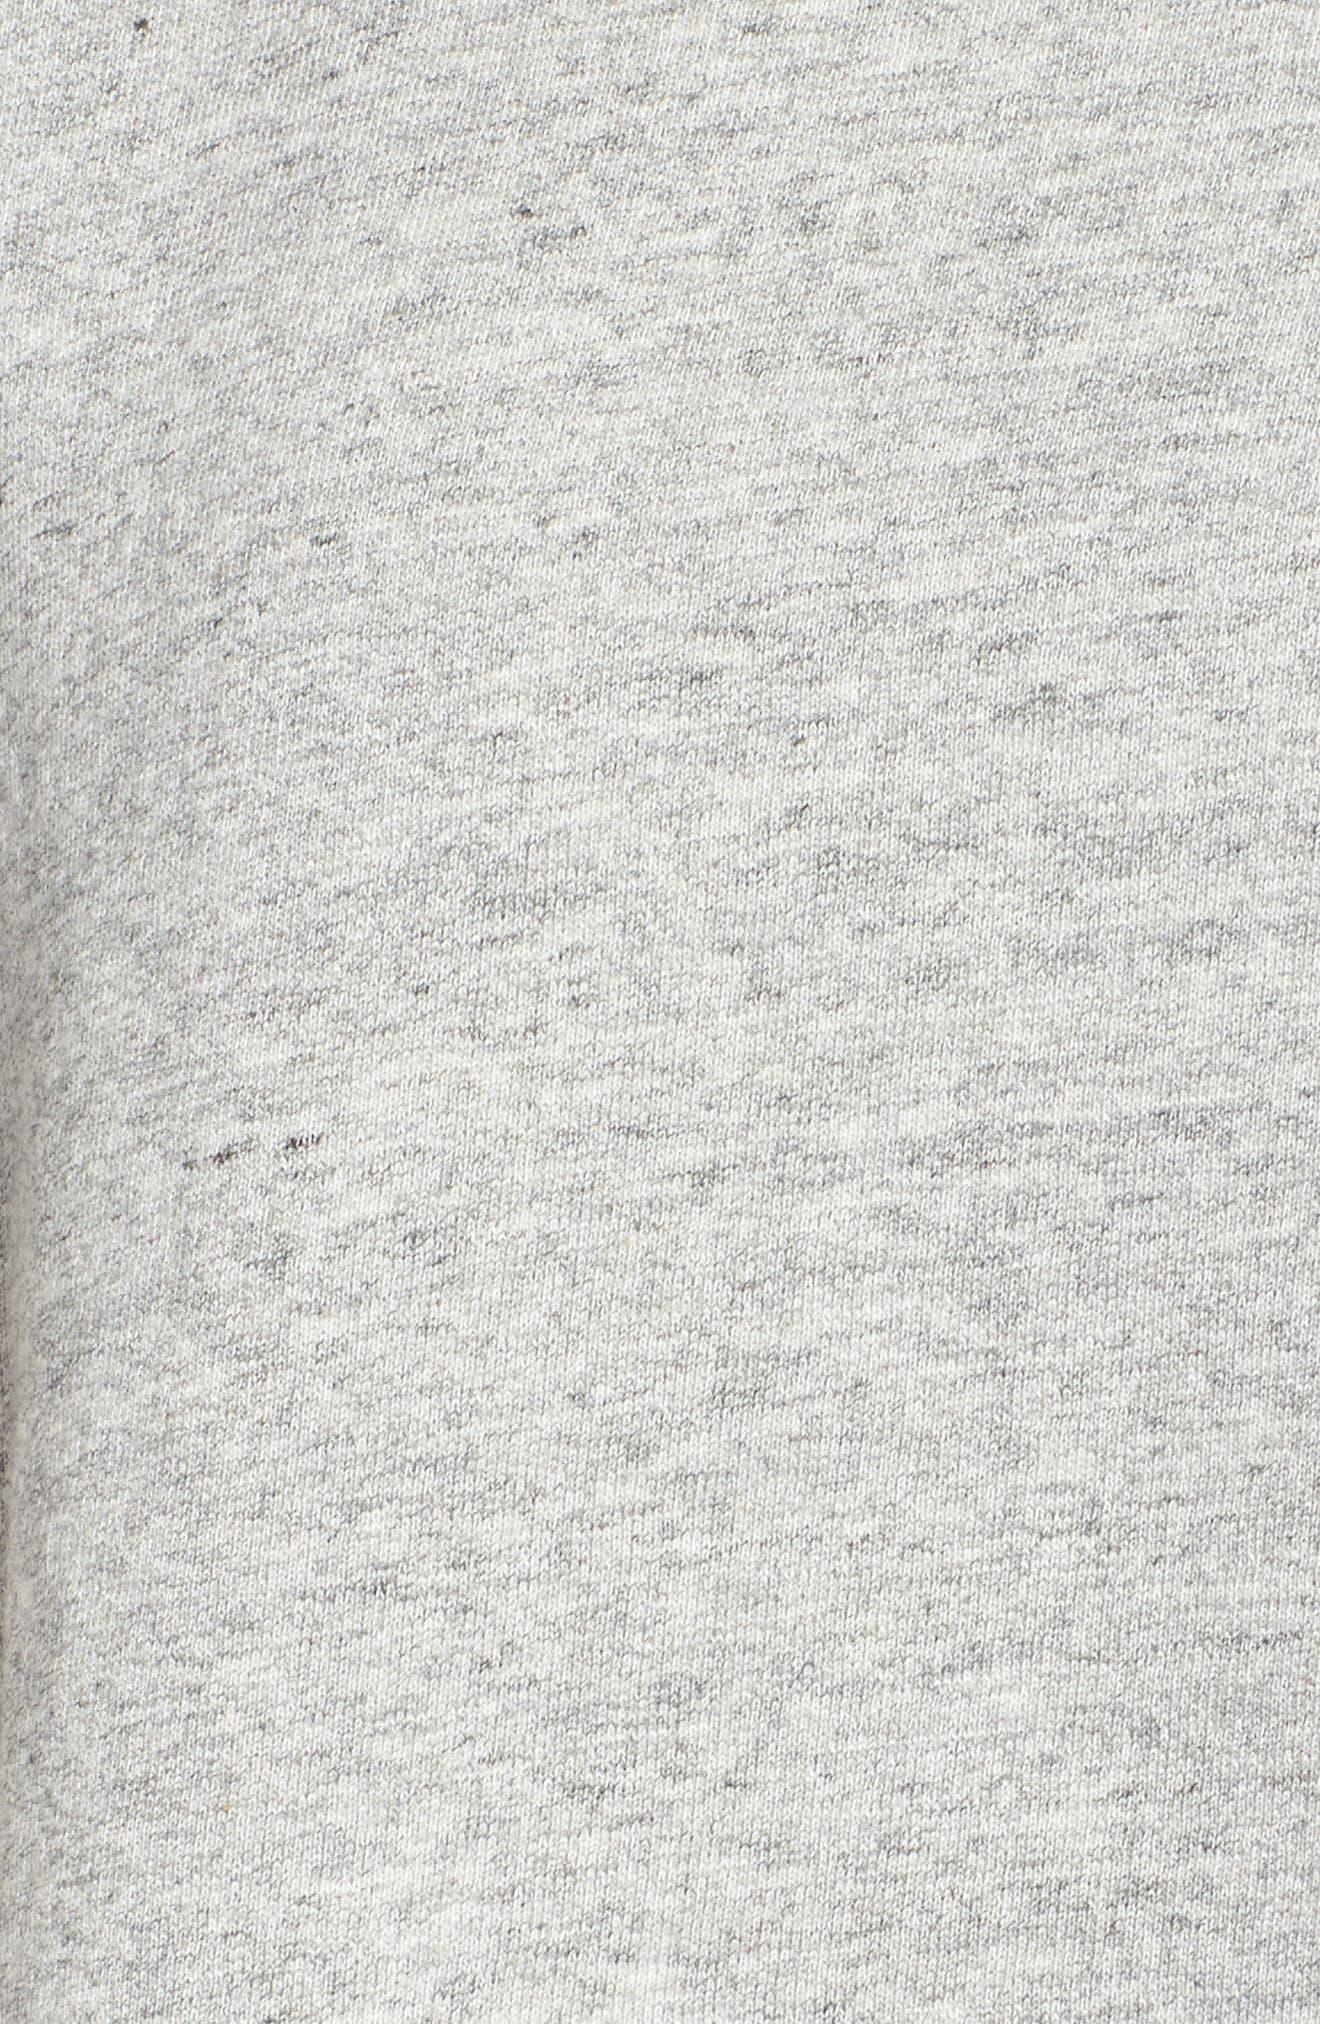 Bes Sweatshirt,                             Alternate thumbnail 5, color,                             Heather Grey